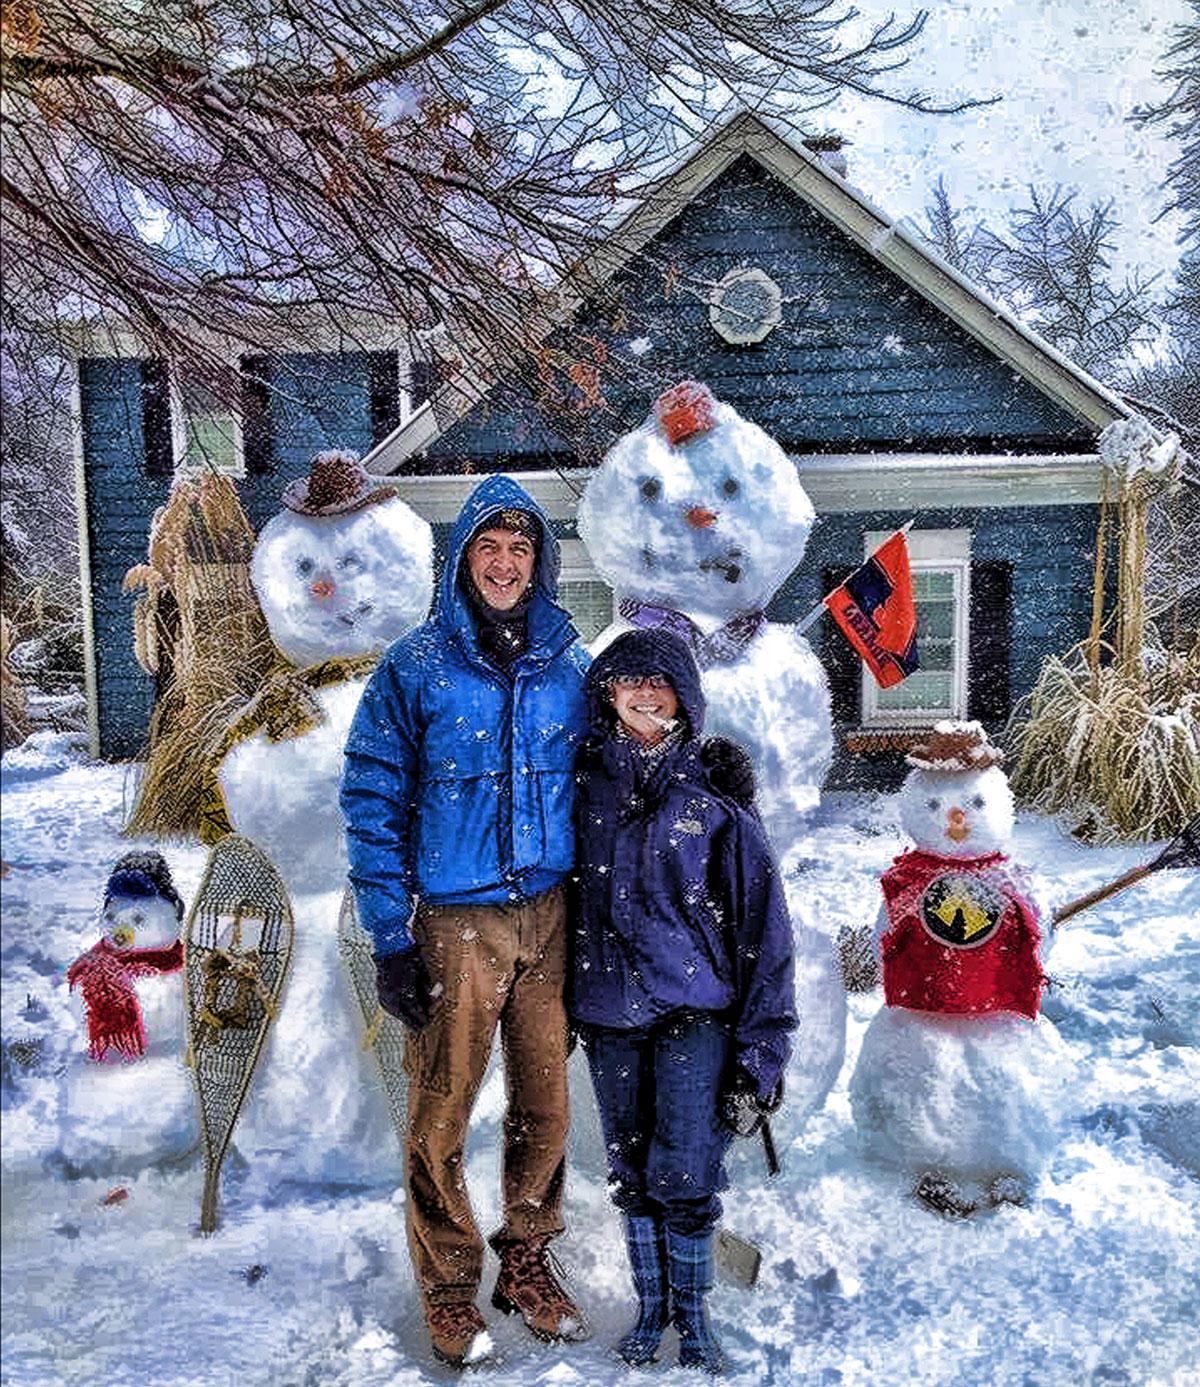 artistic photo - family with snowmen